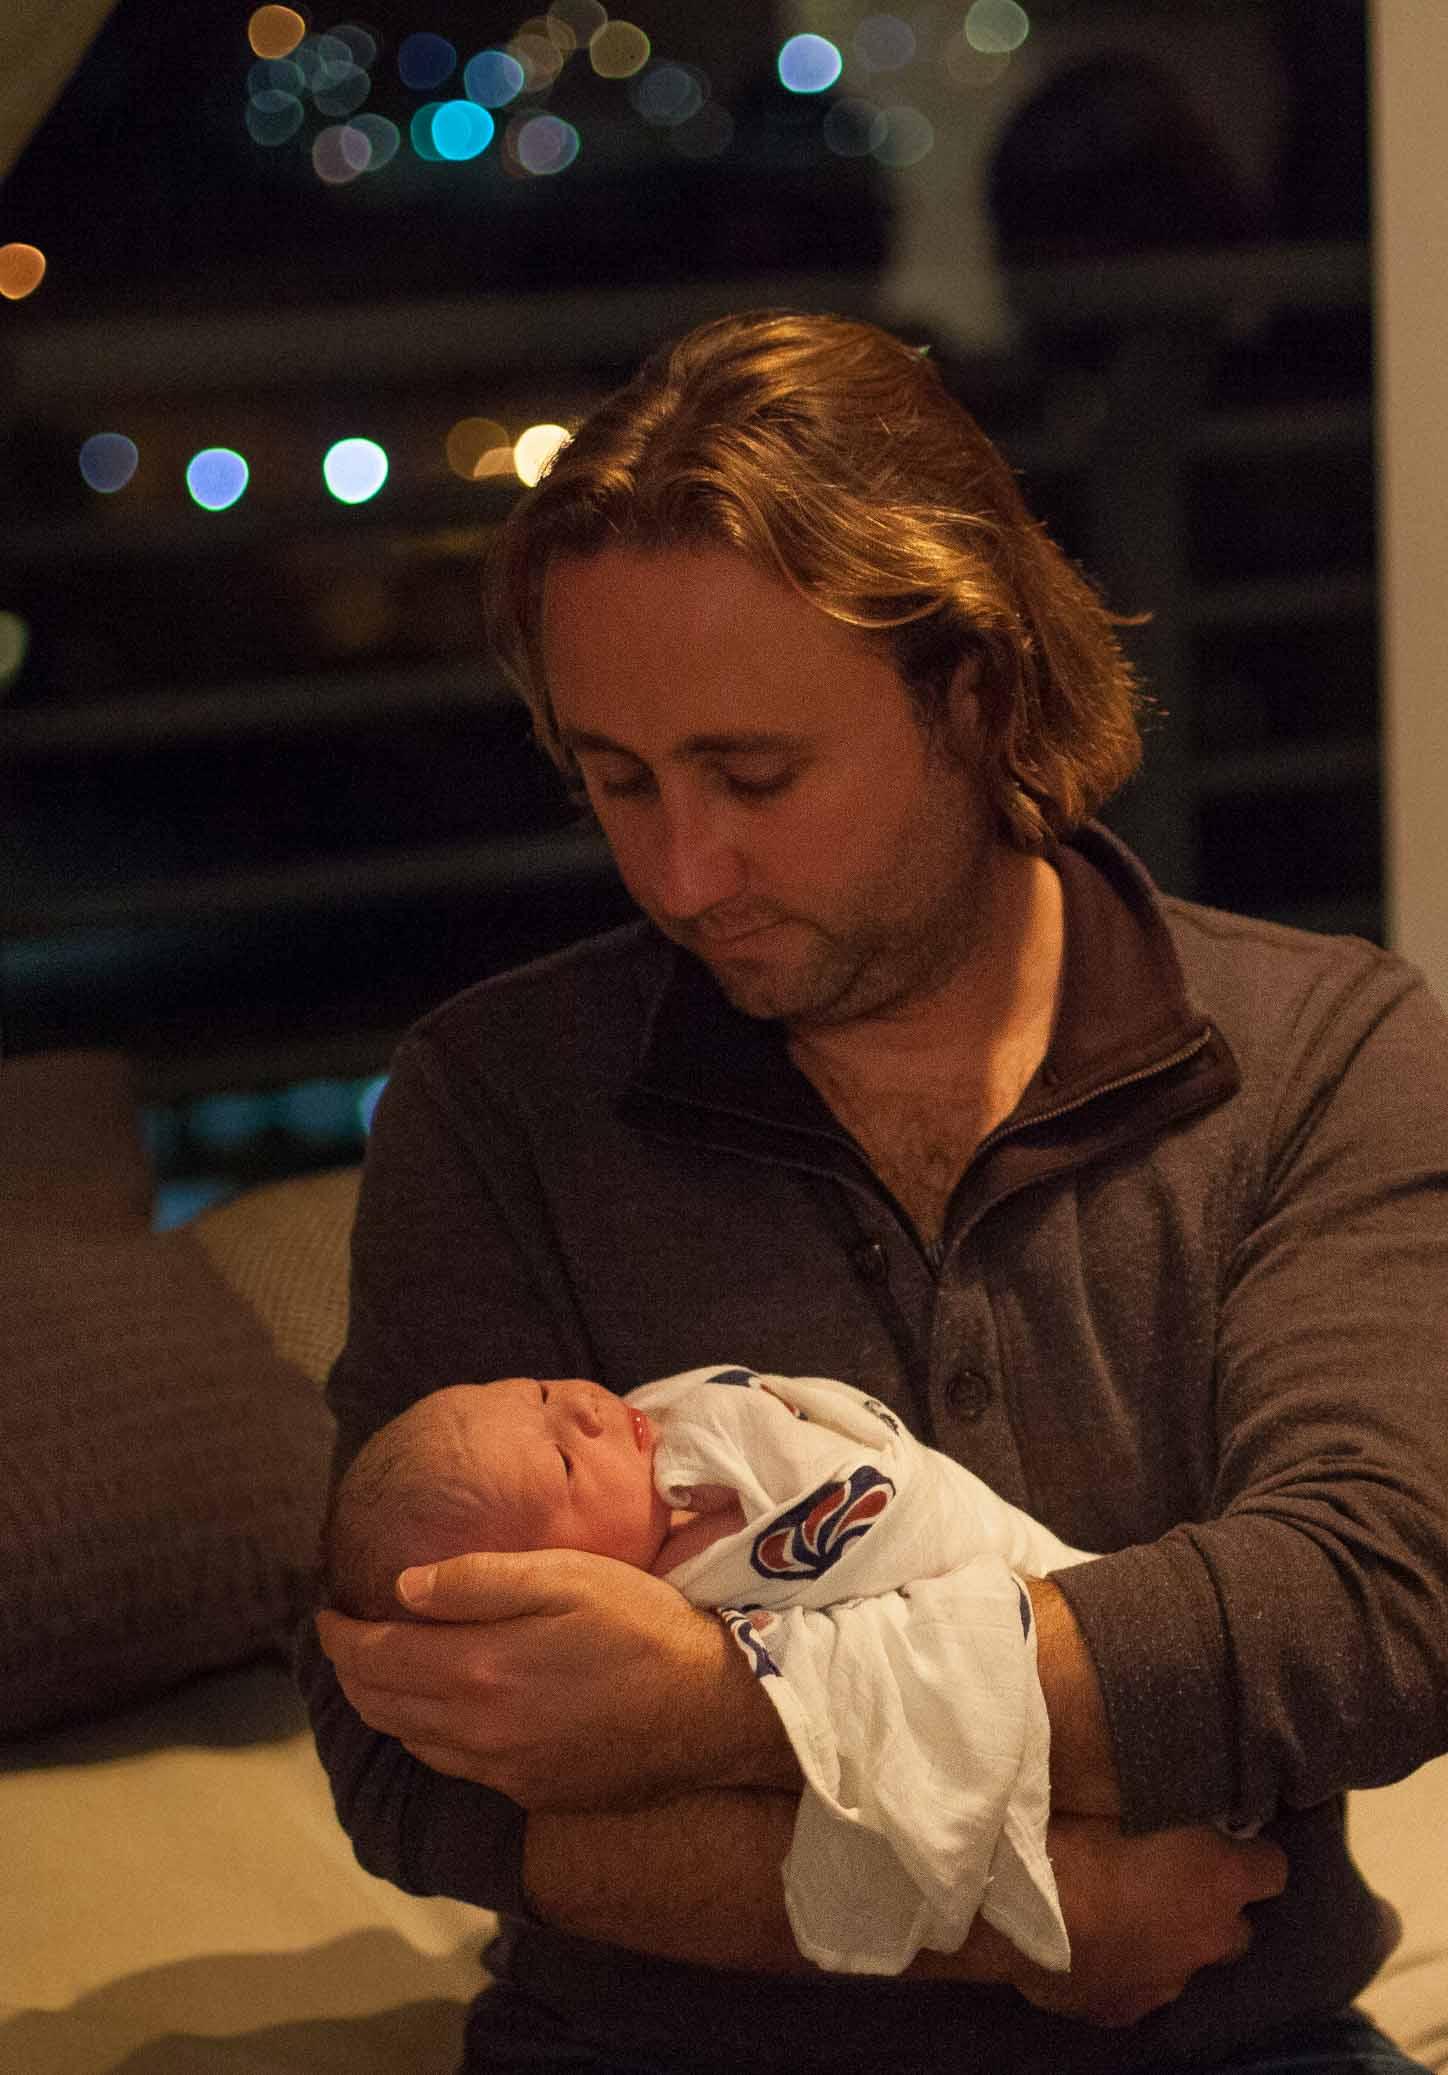 birth-photographer-boca-photography-near-me-birth-center-delray-beach-hollywood-breastfeeding-doula-midwife-childbirth-34.jpg